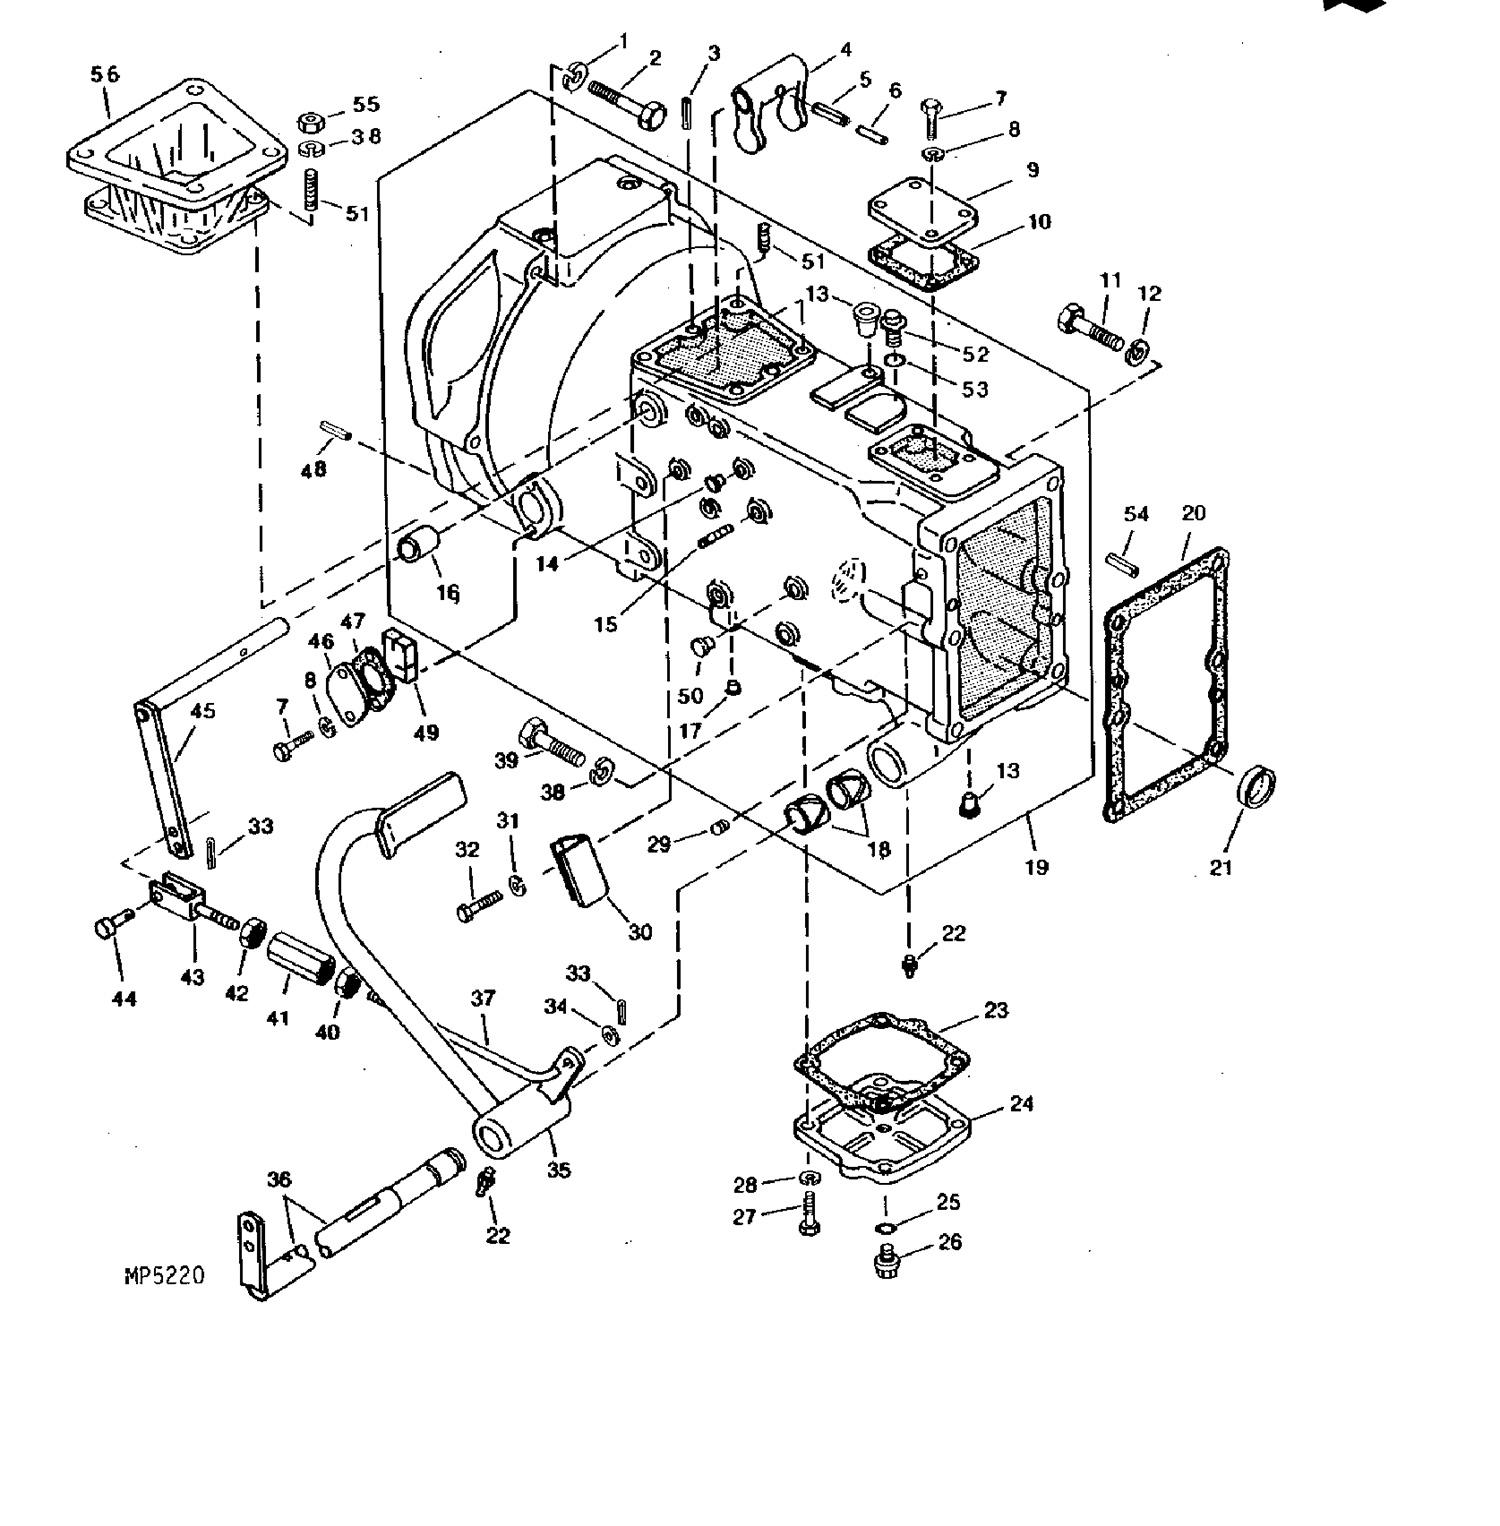 Clutch Parts for John Deere Compact Tractors